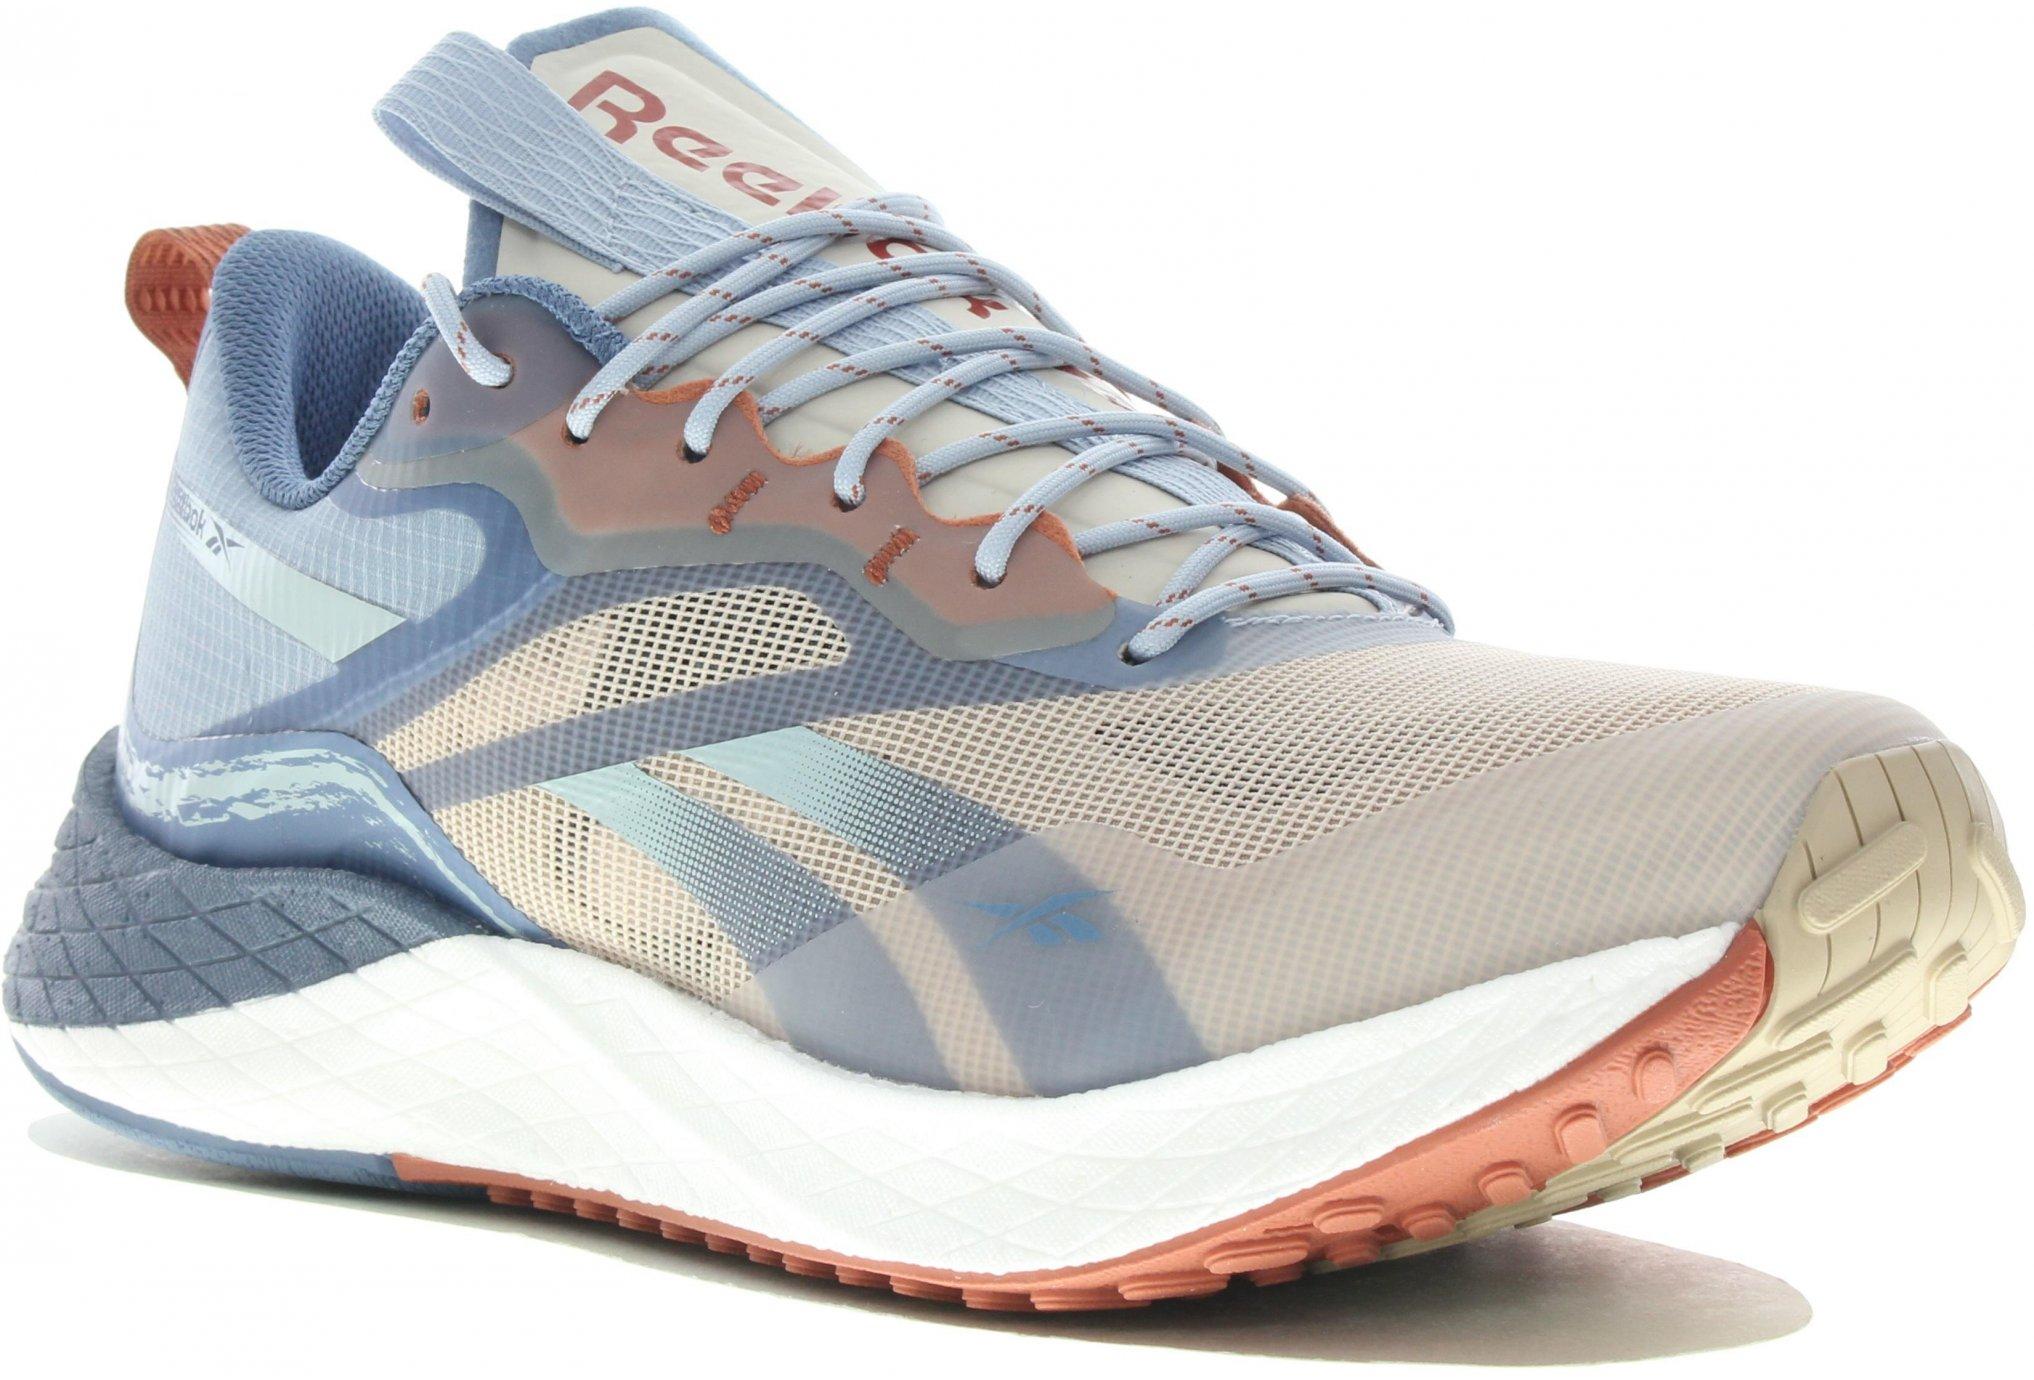 Reebok Floatride Energy 3.0 Adventure W Chaussures running femme